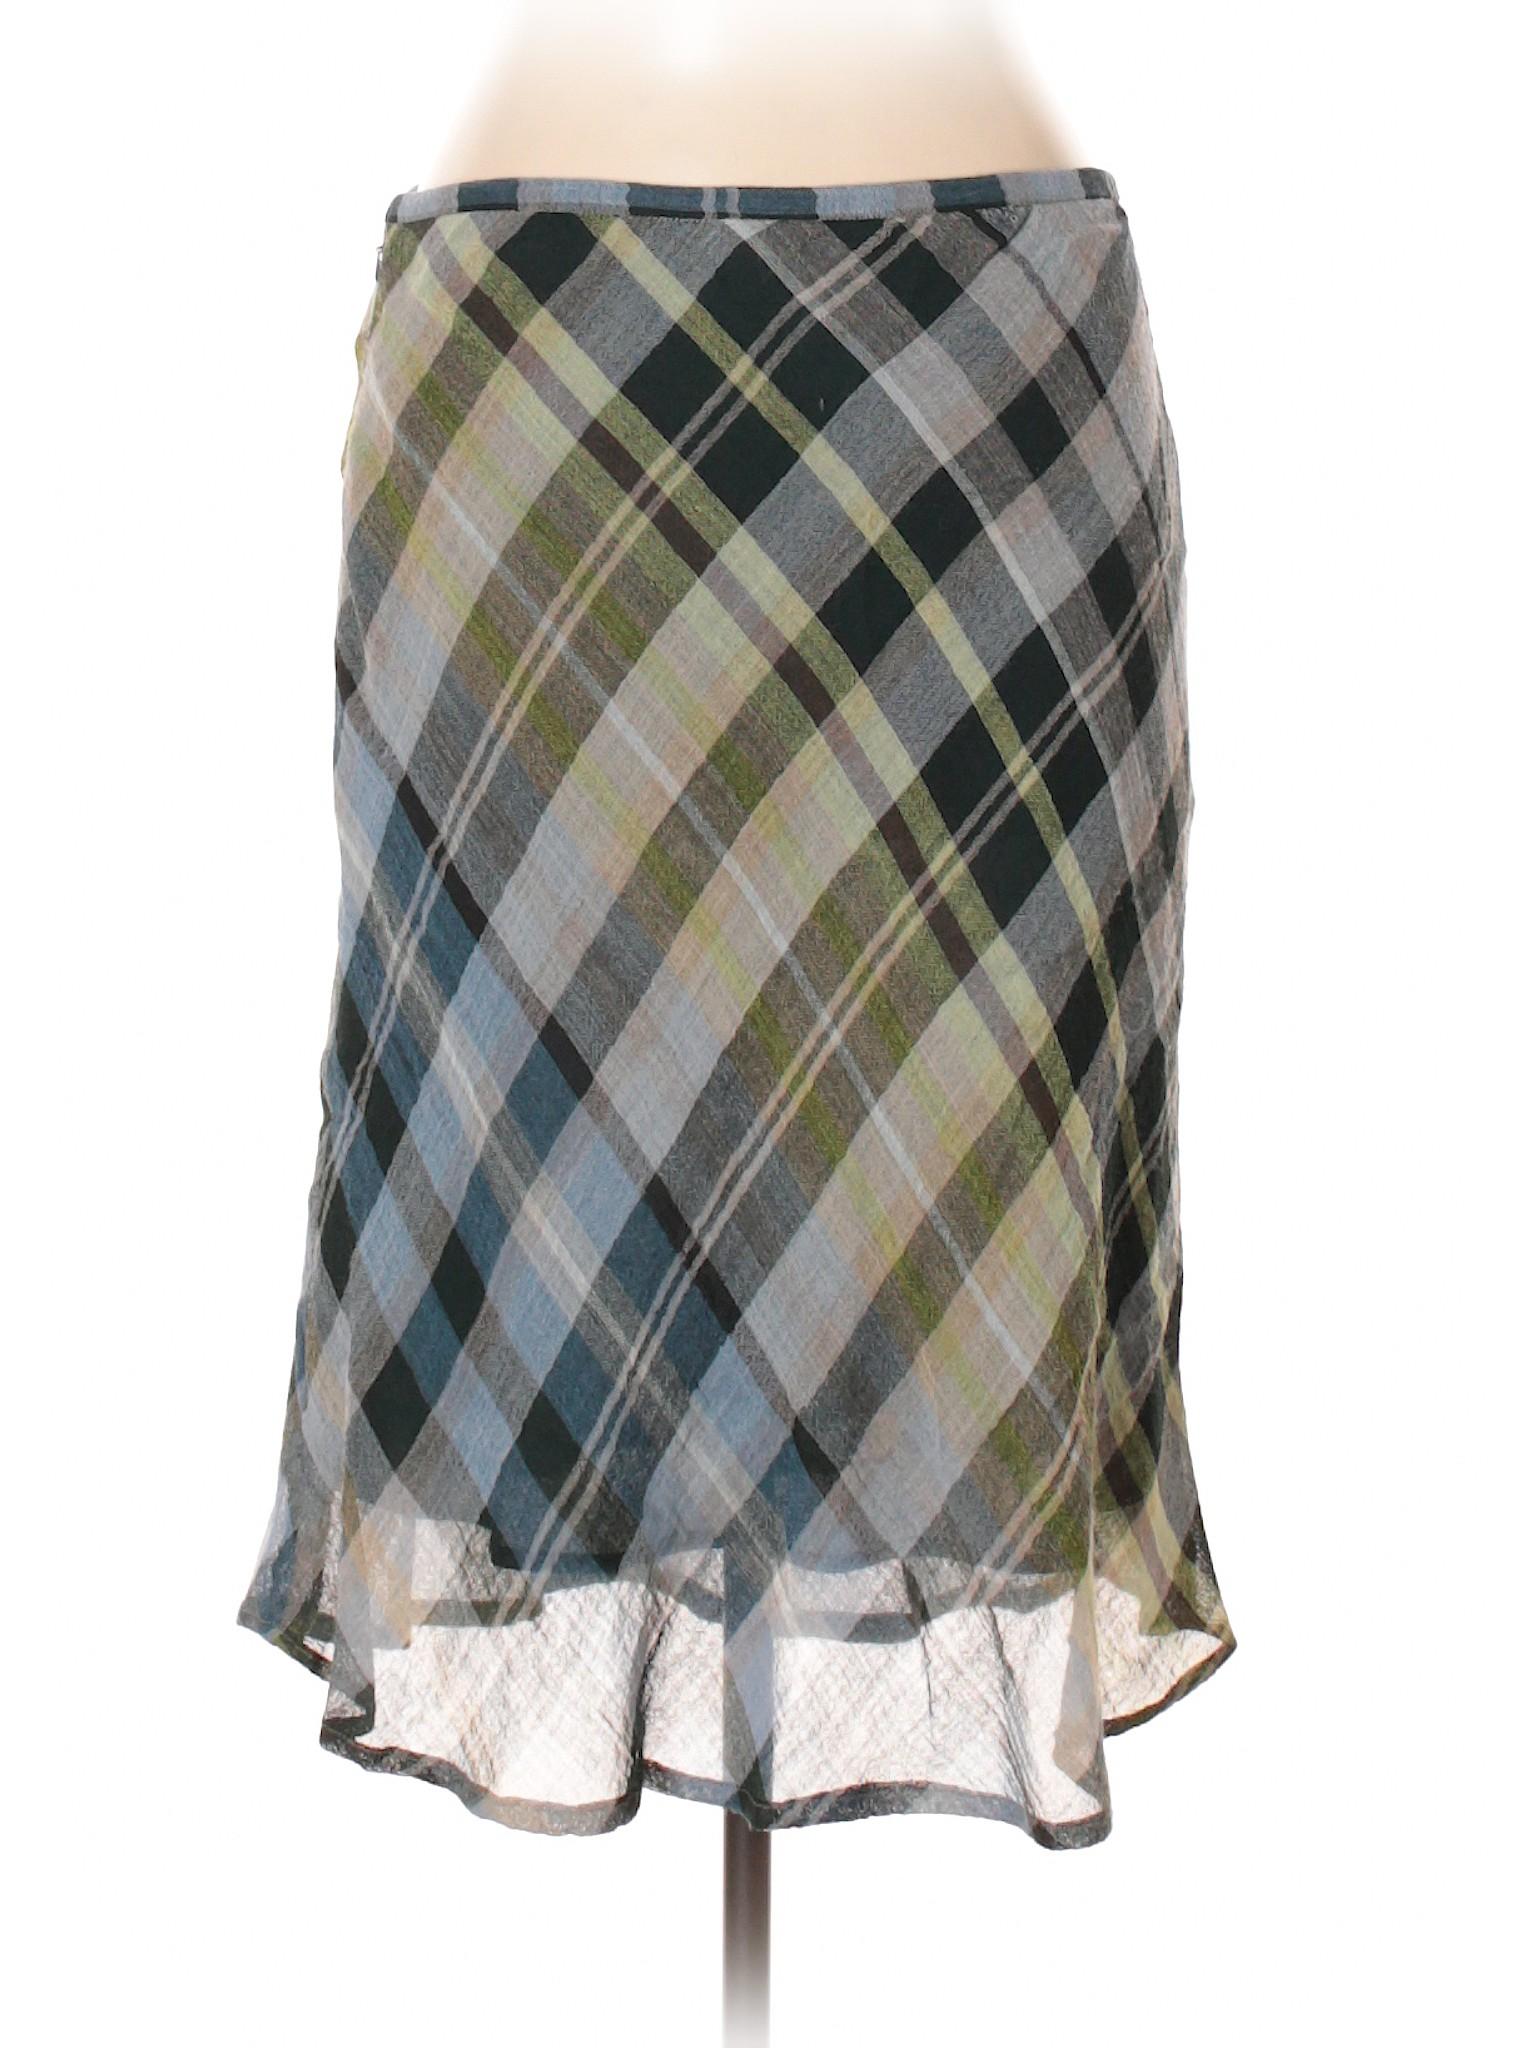 Casual Boutique Boutique Skirt Boutique Casual Skirt Casual Casual Skirt Skirt Boutique HzfwnYq85